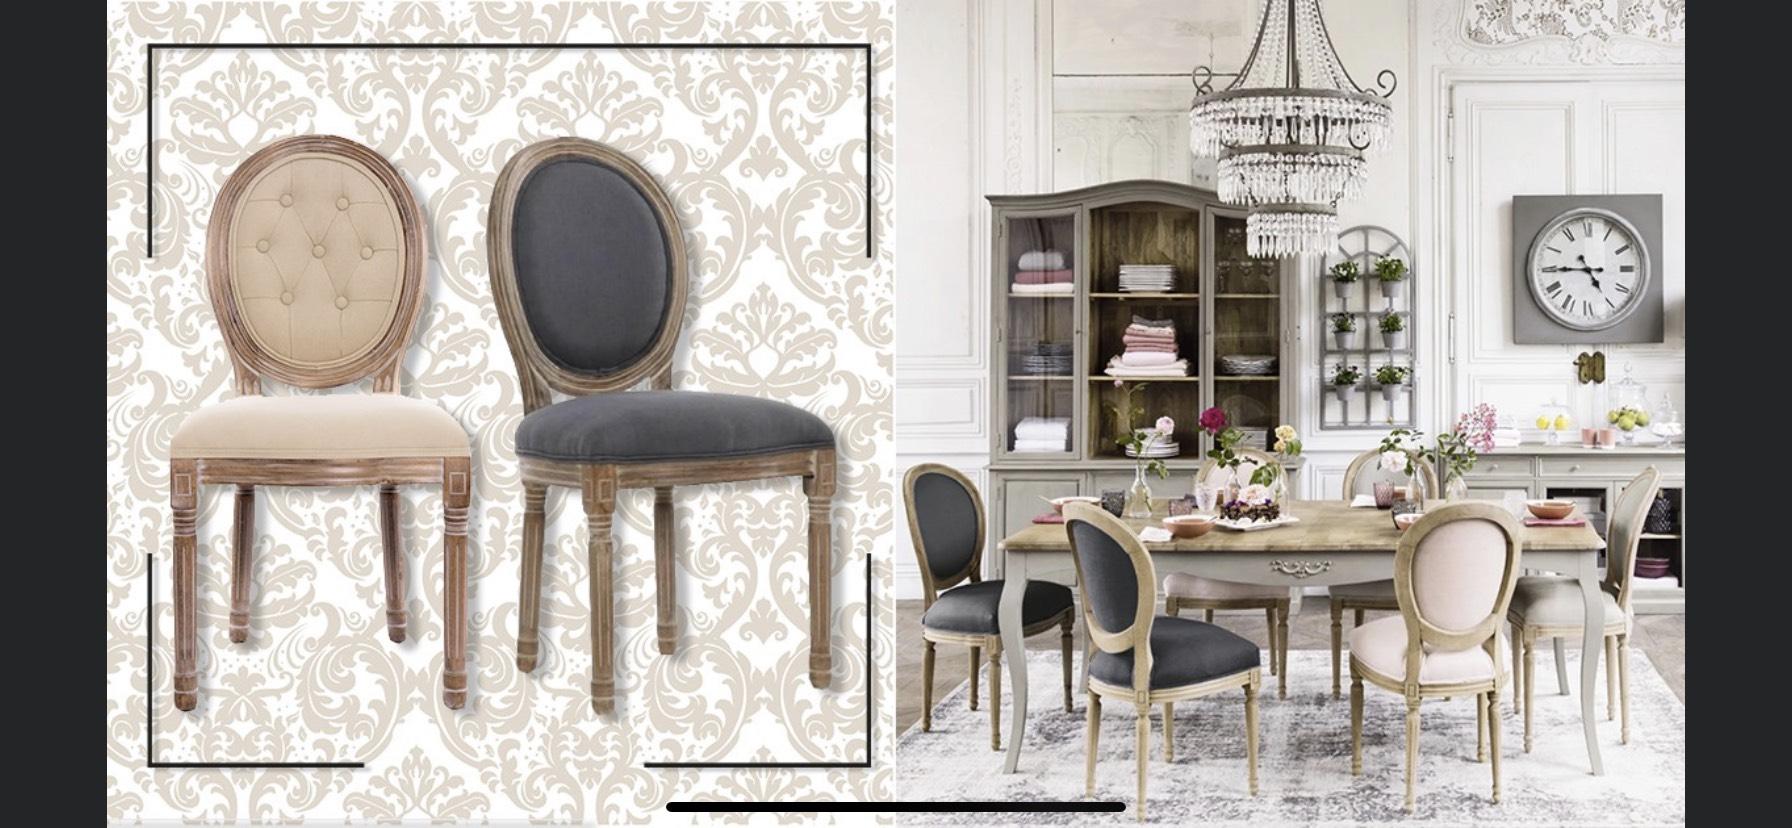 Chaise médaillon - Style Louis XVI ou velours gris - Chêne massif